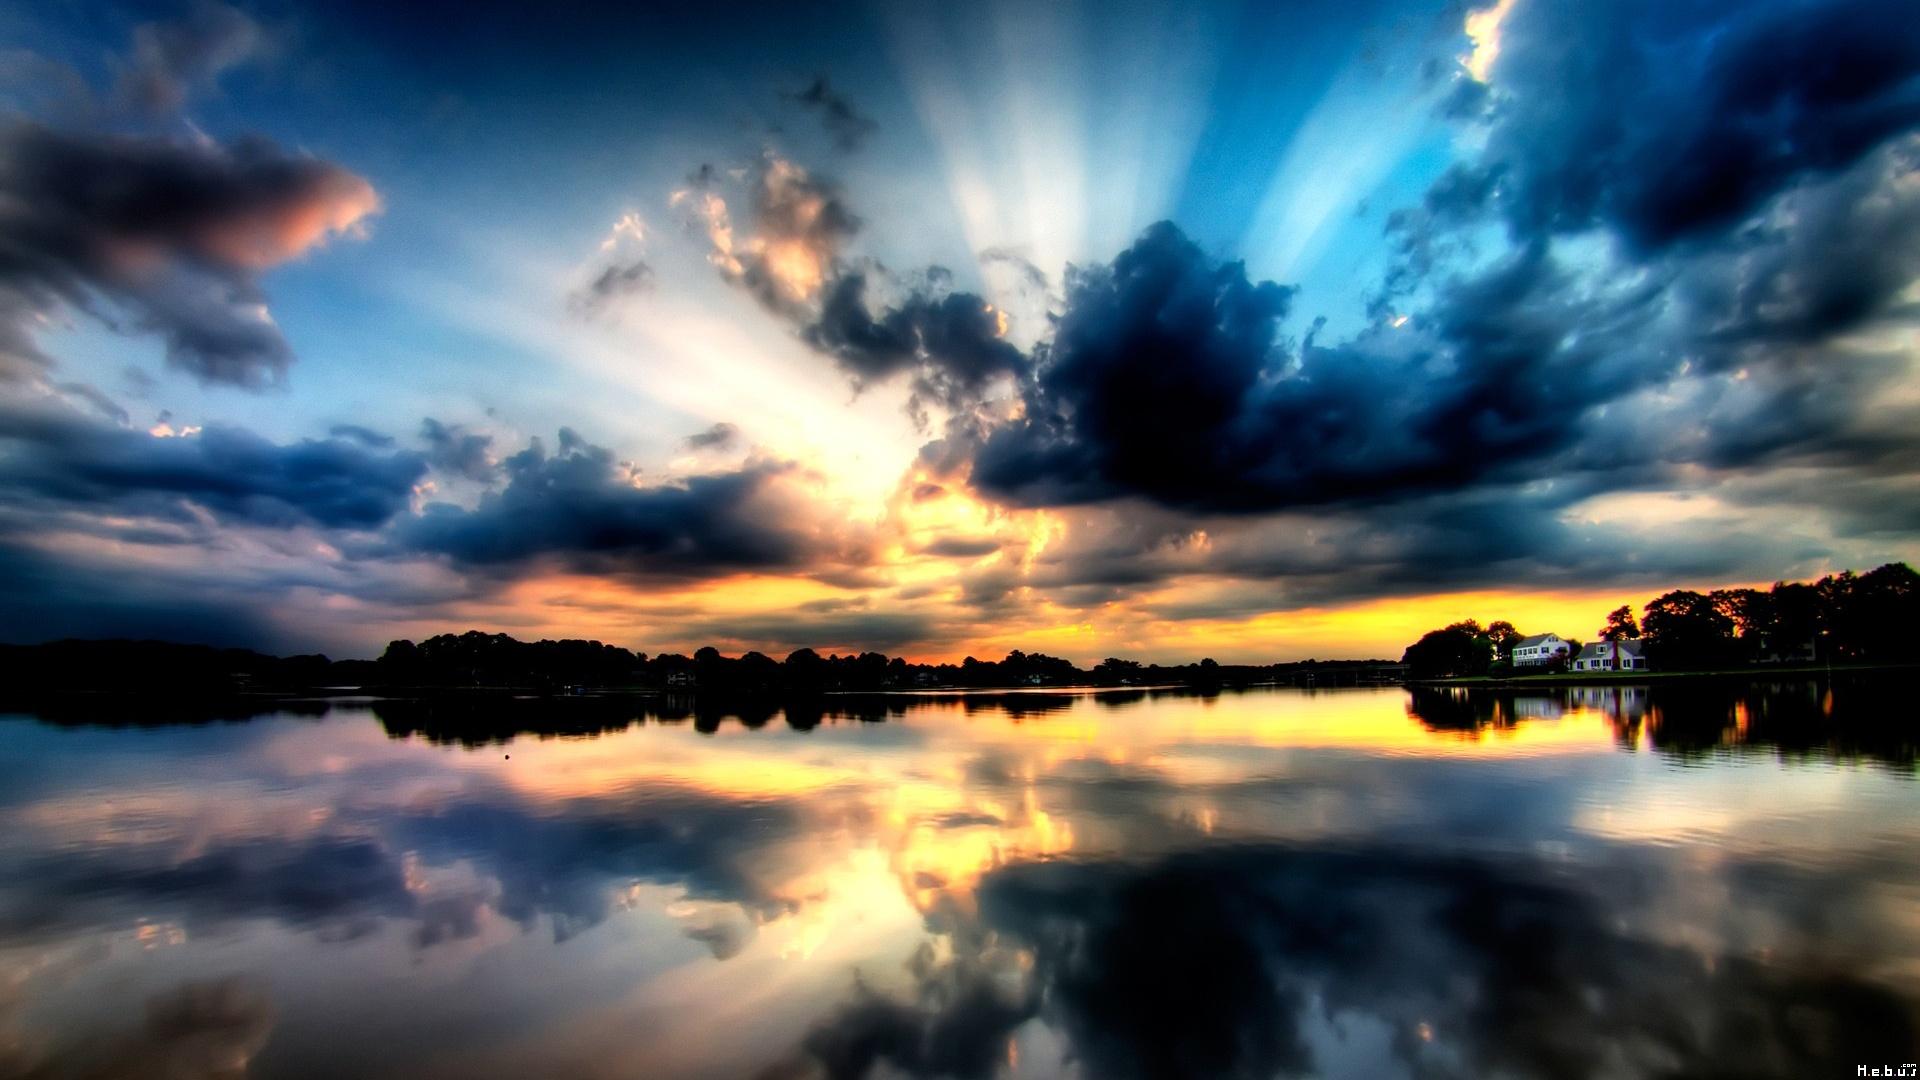 Sunset Lake Sky Cloud Reflection Water Tree House 1920x1080